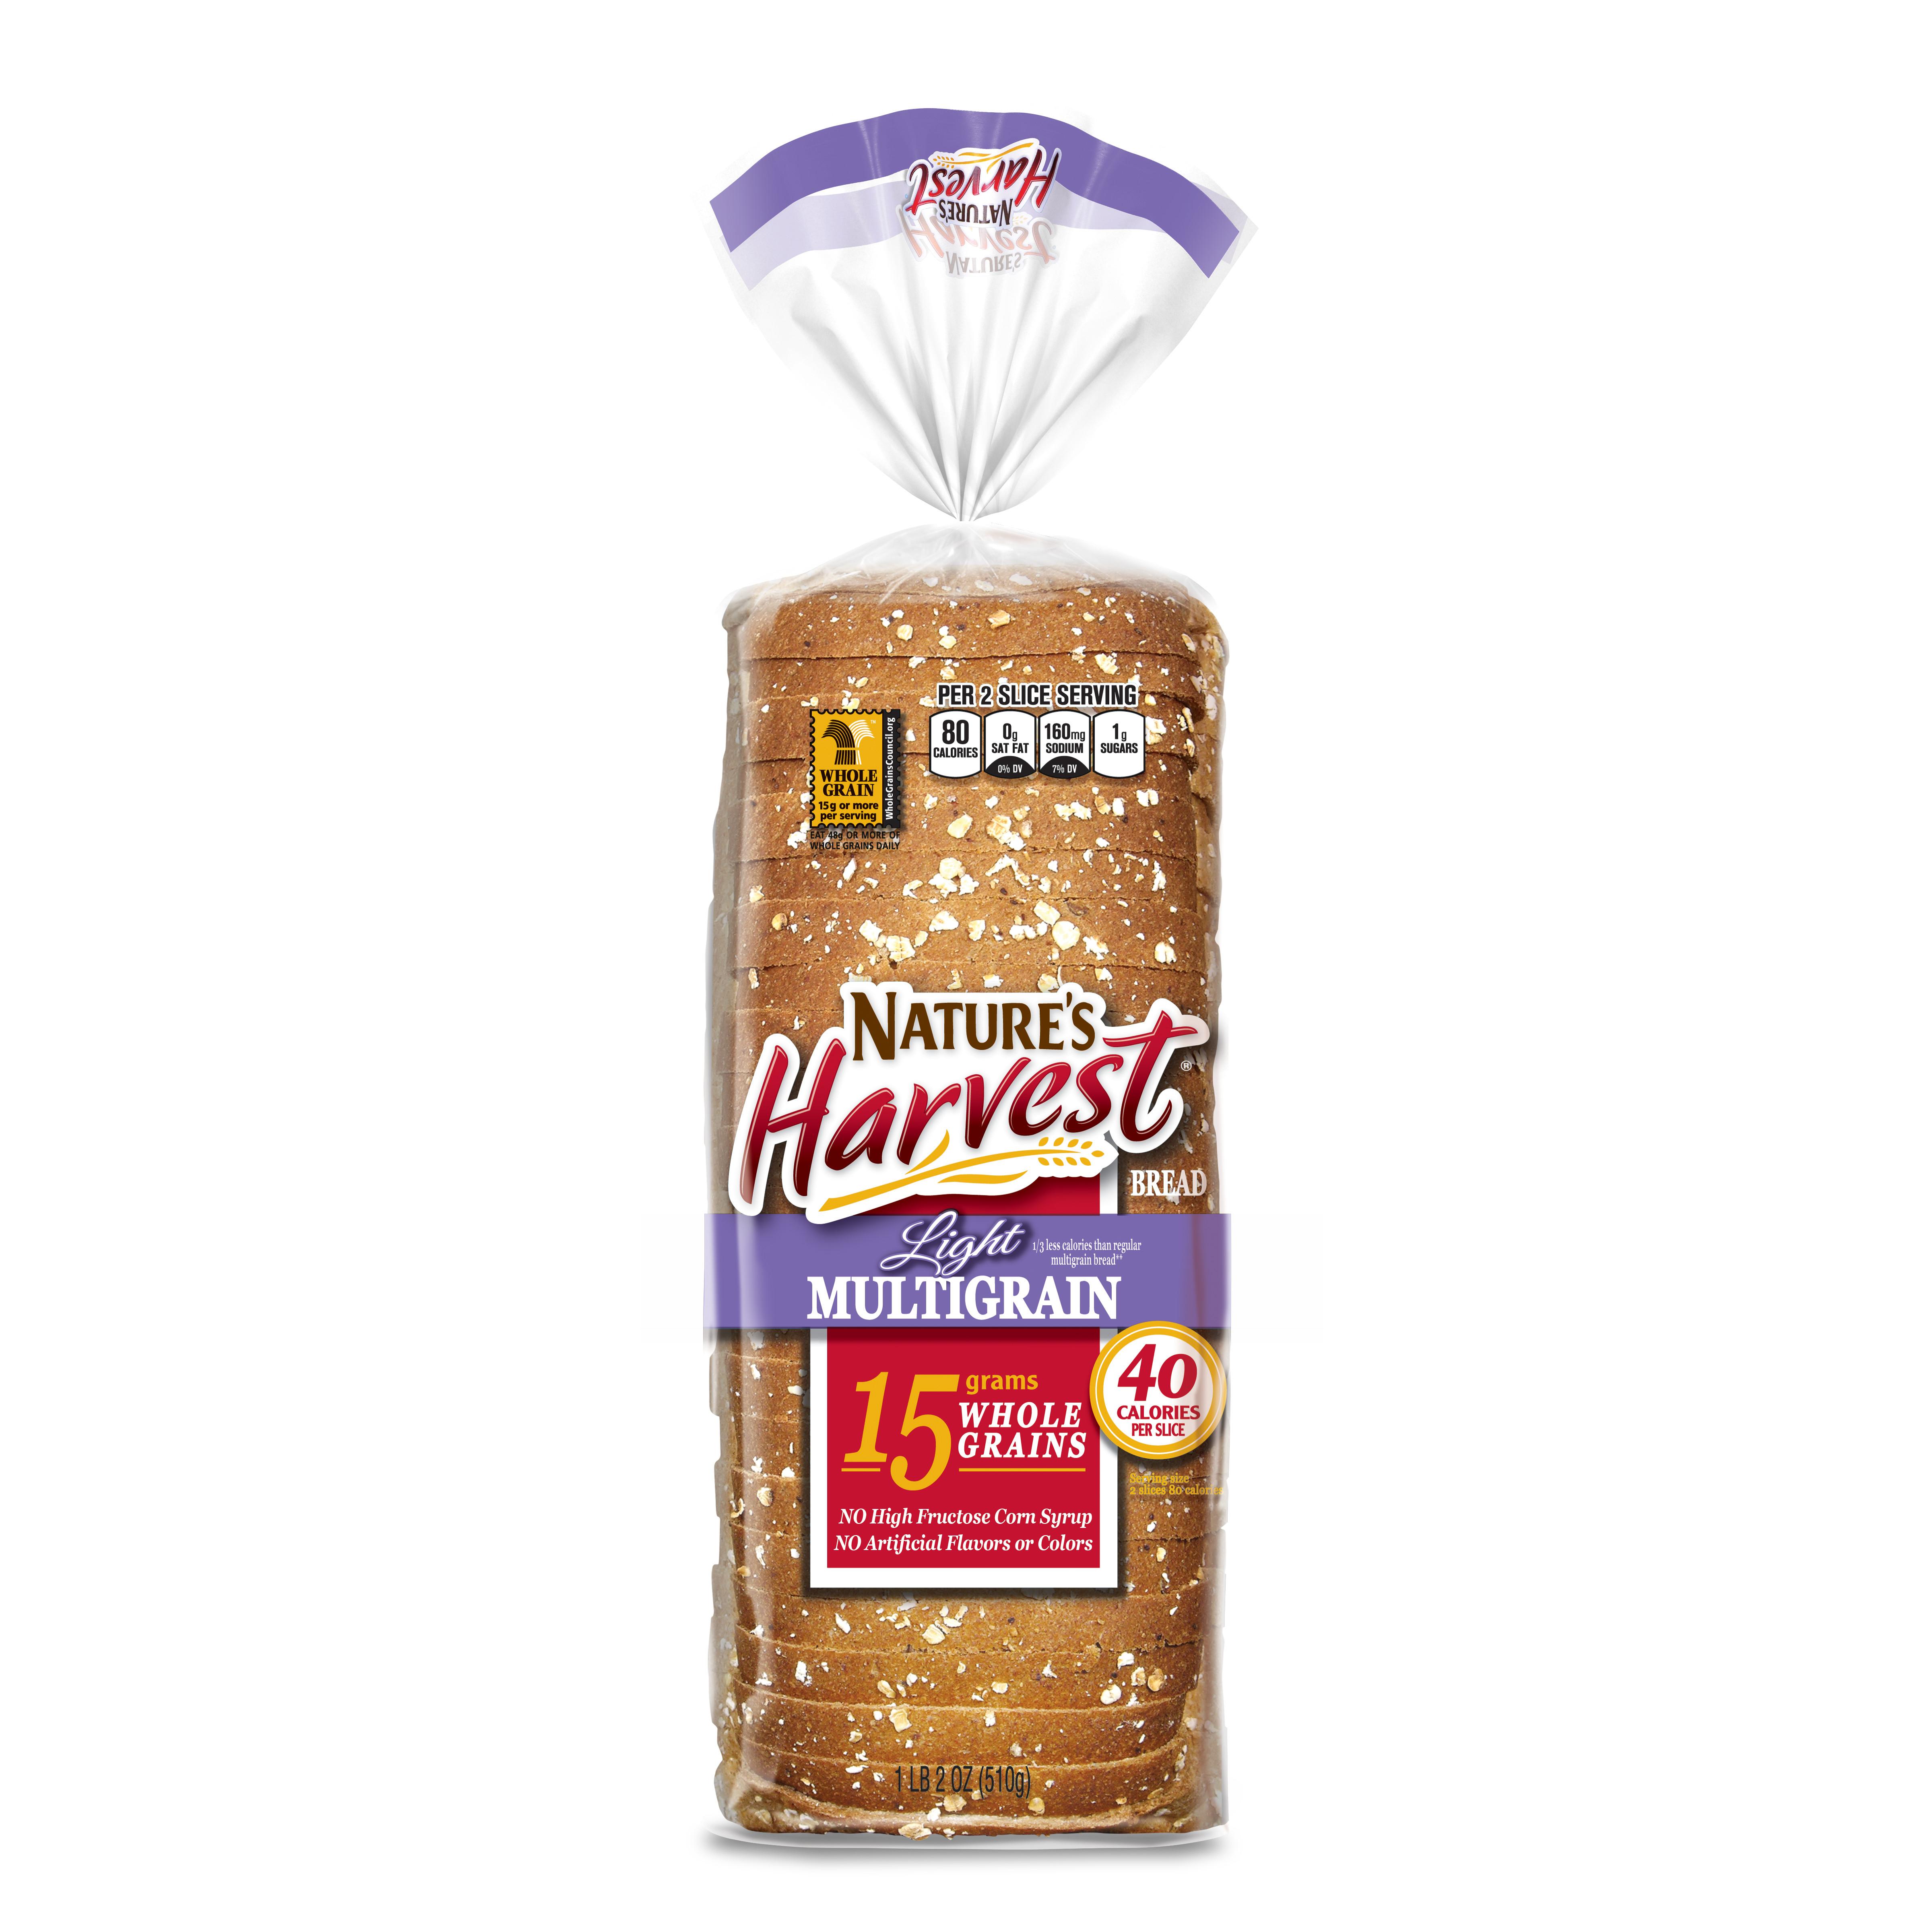 Nature's Harvest Light Multigrain Bread 18 oz